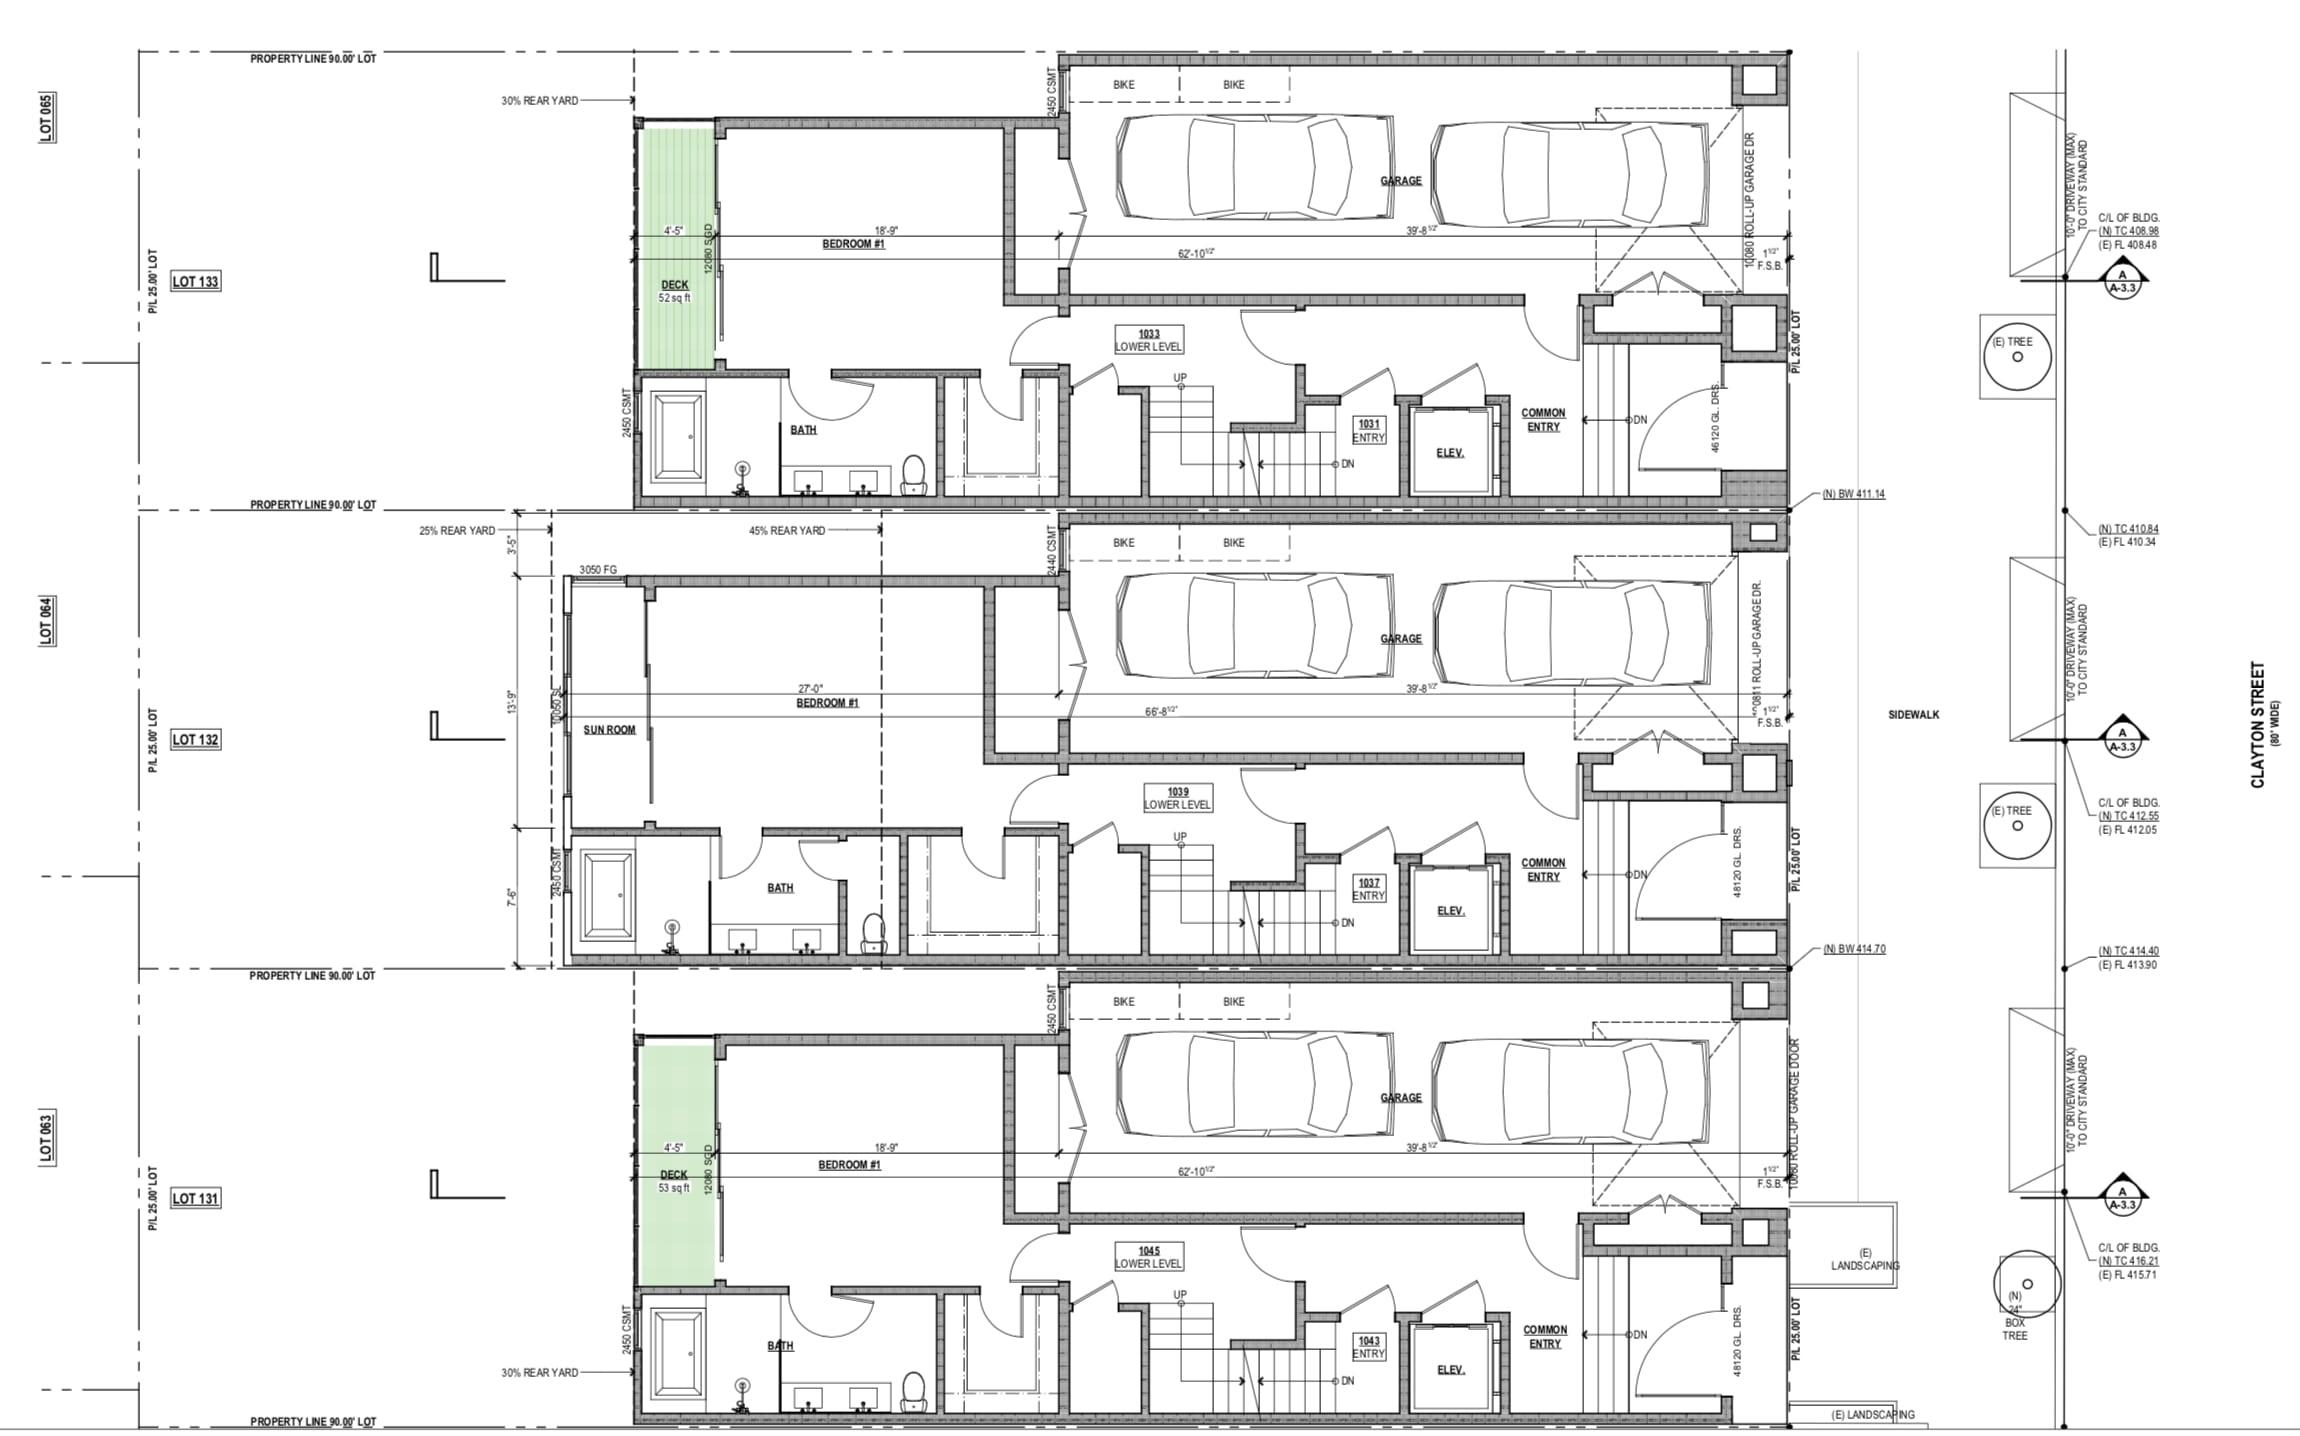 1043-45 Clayton St Proposed Ground Floor Plan